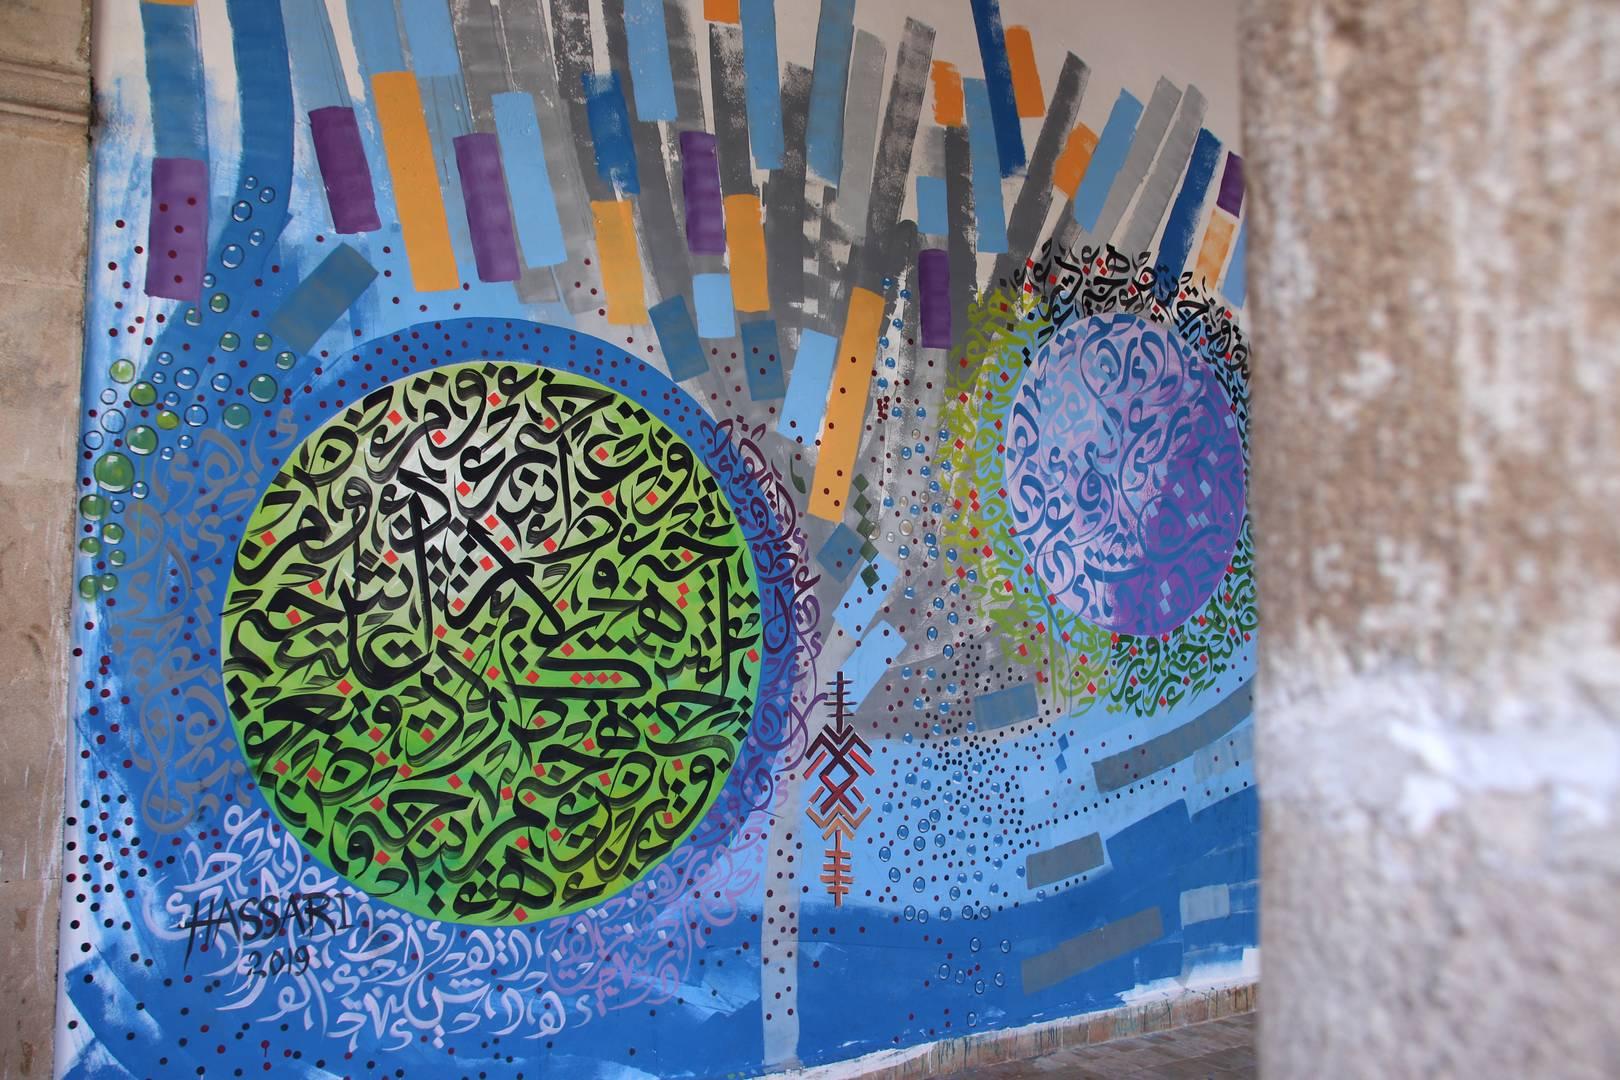 Maroc - Street art dans la médina d'Essaouira